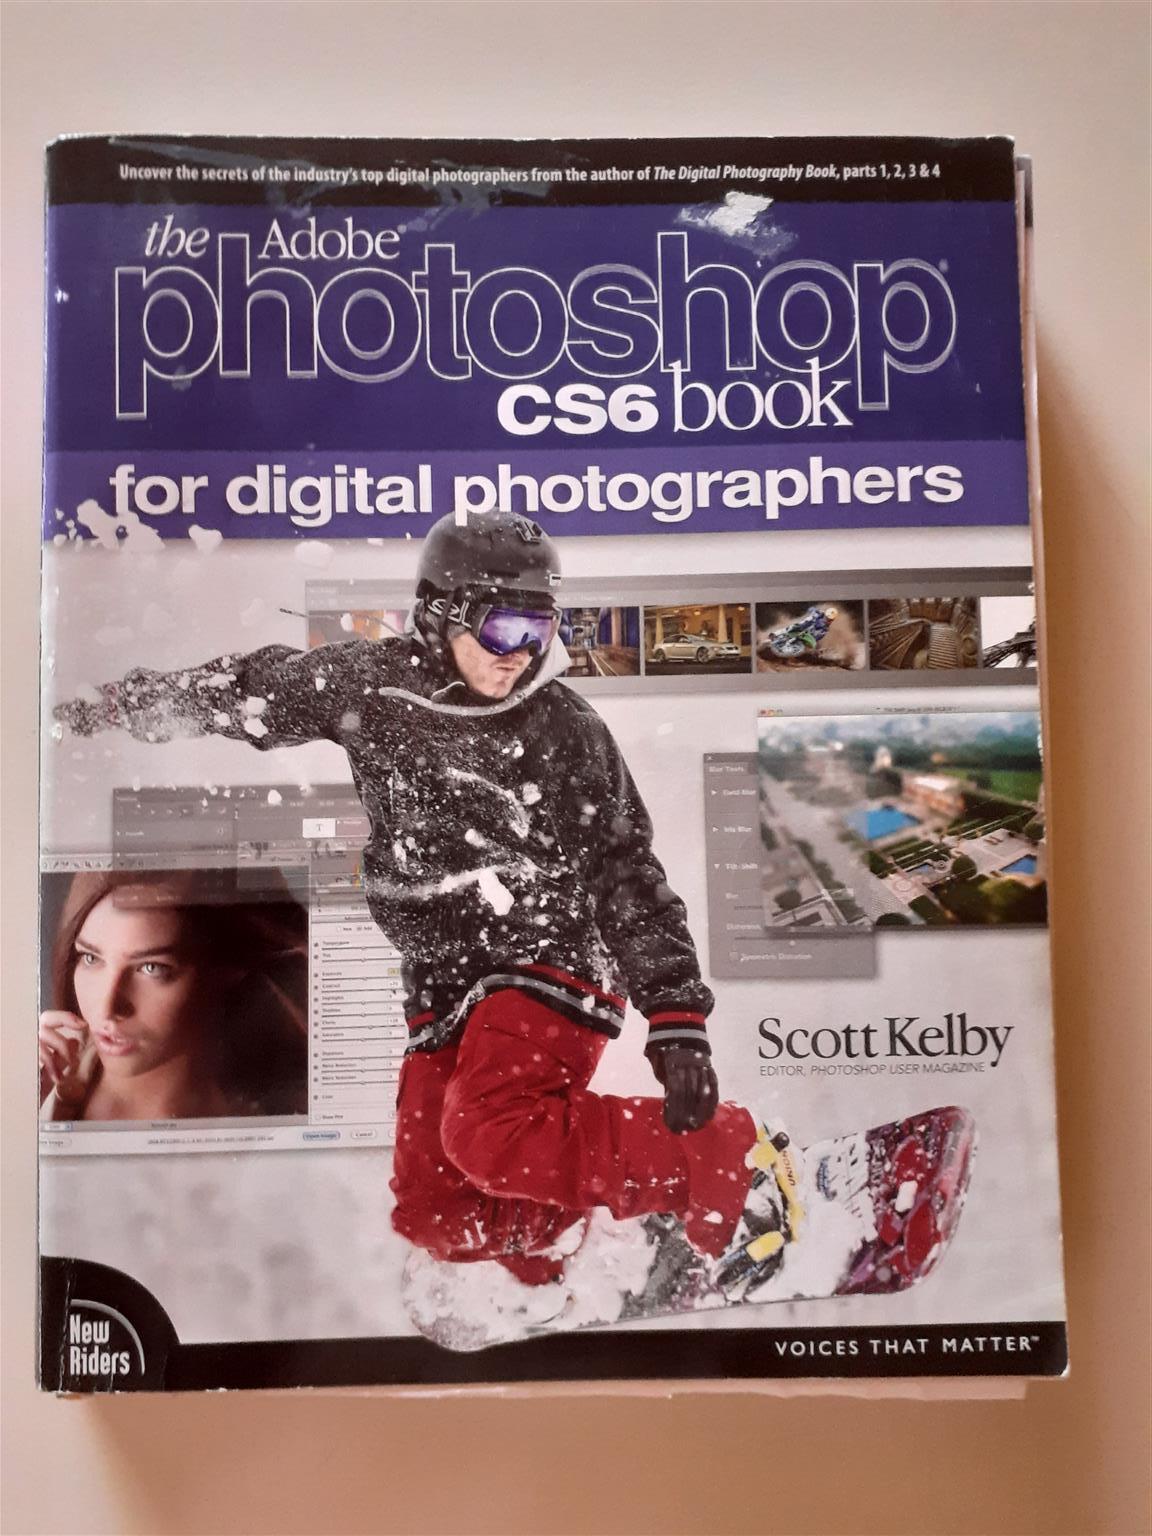 Photoshop photography book